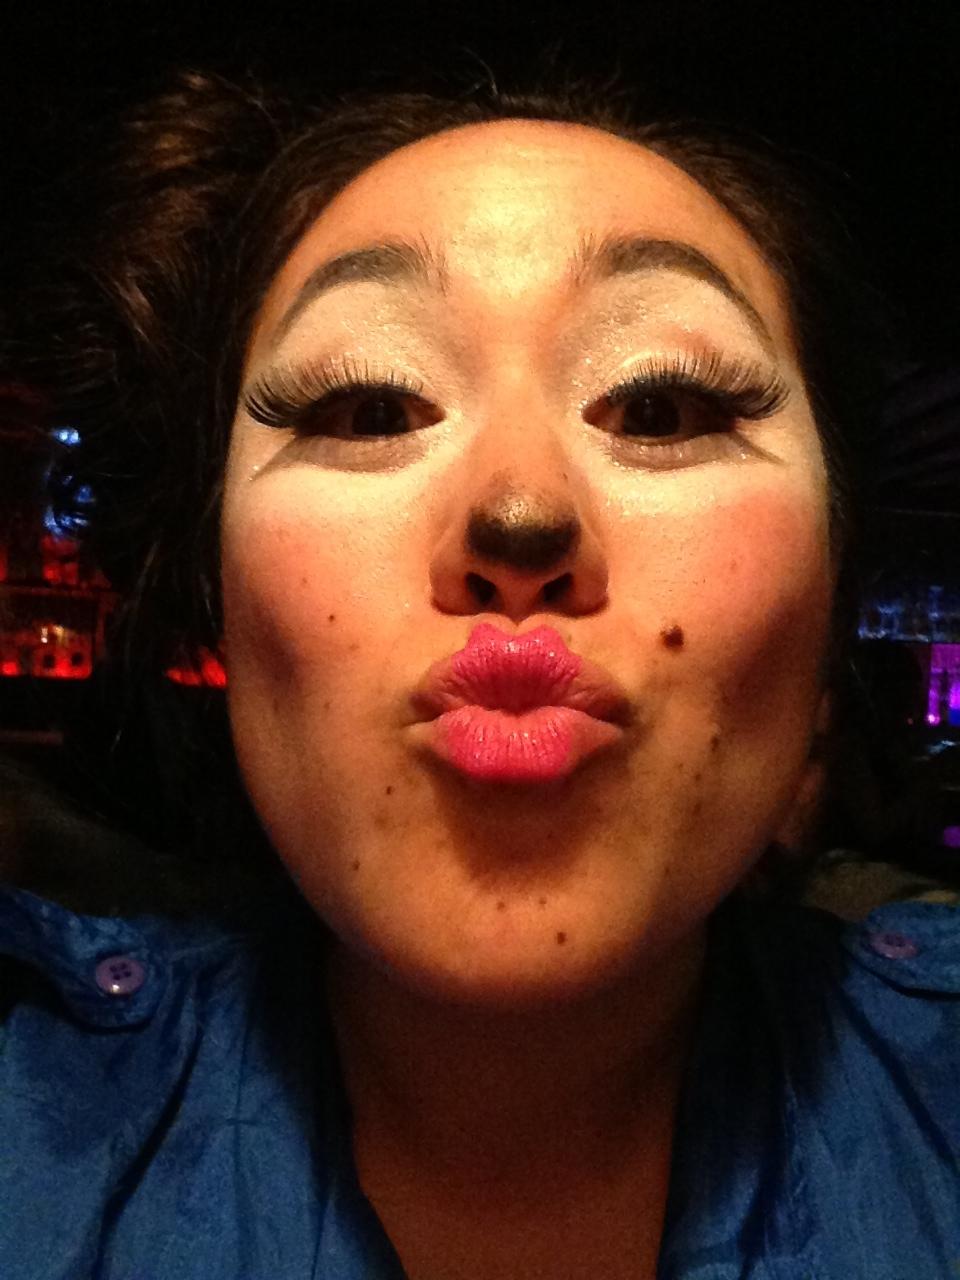 exHOTic other kisses.JPG